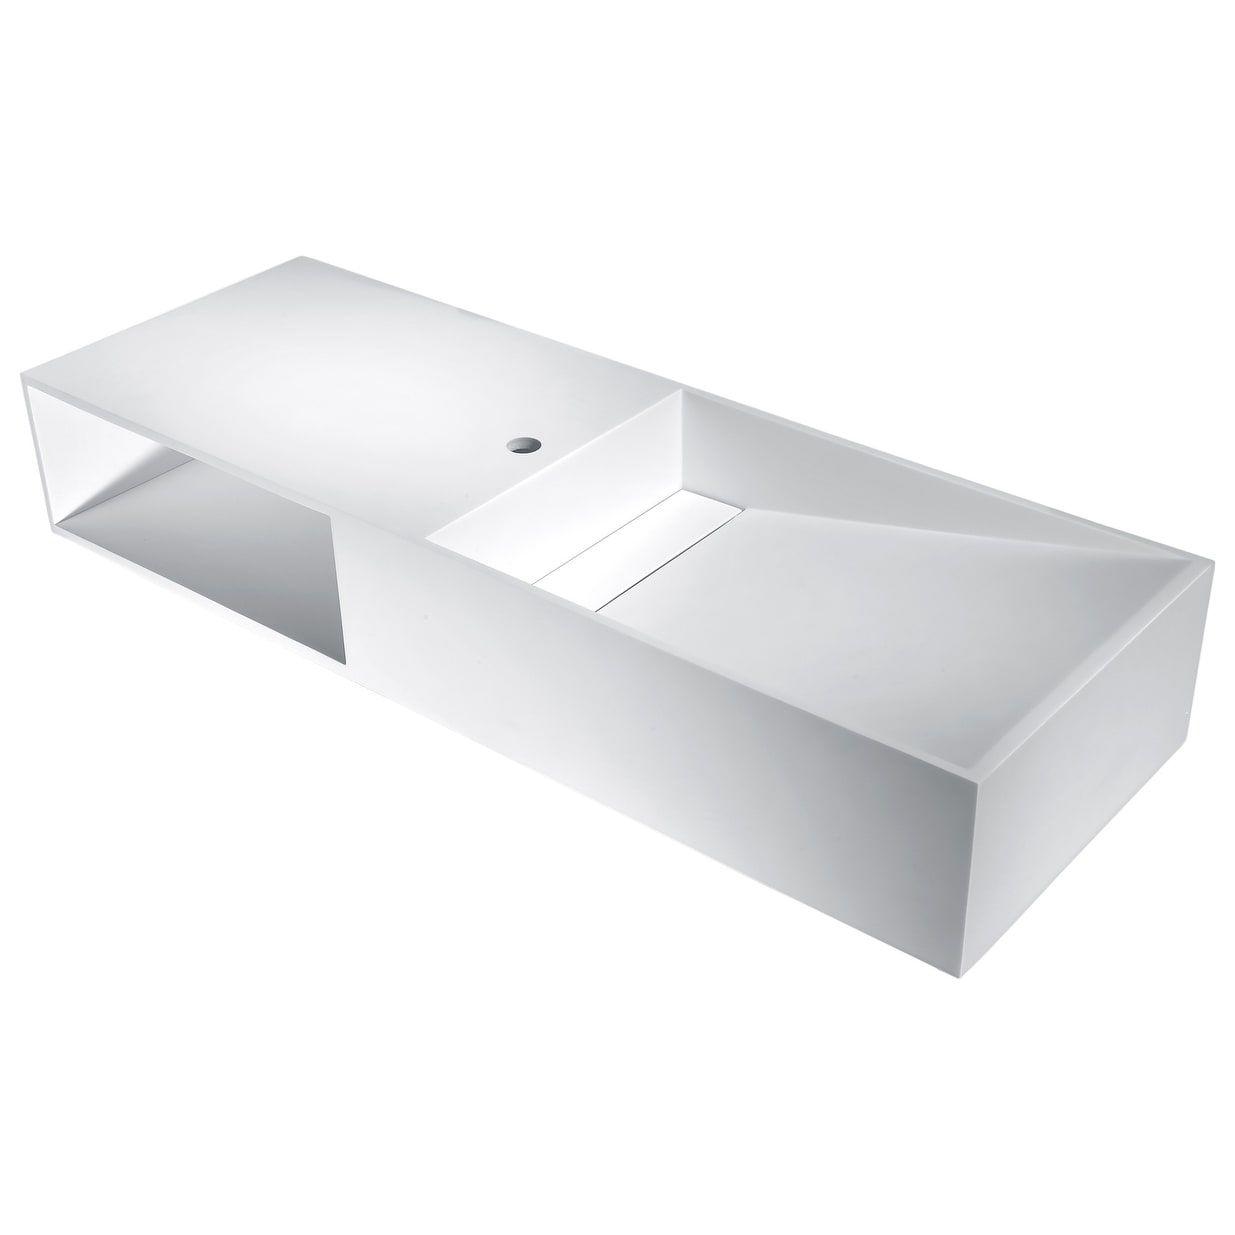 Anzzi Harmsia Vessel Sink in Matte White | Vessel sink, Sinks and ...